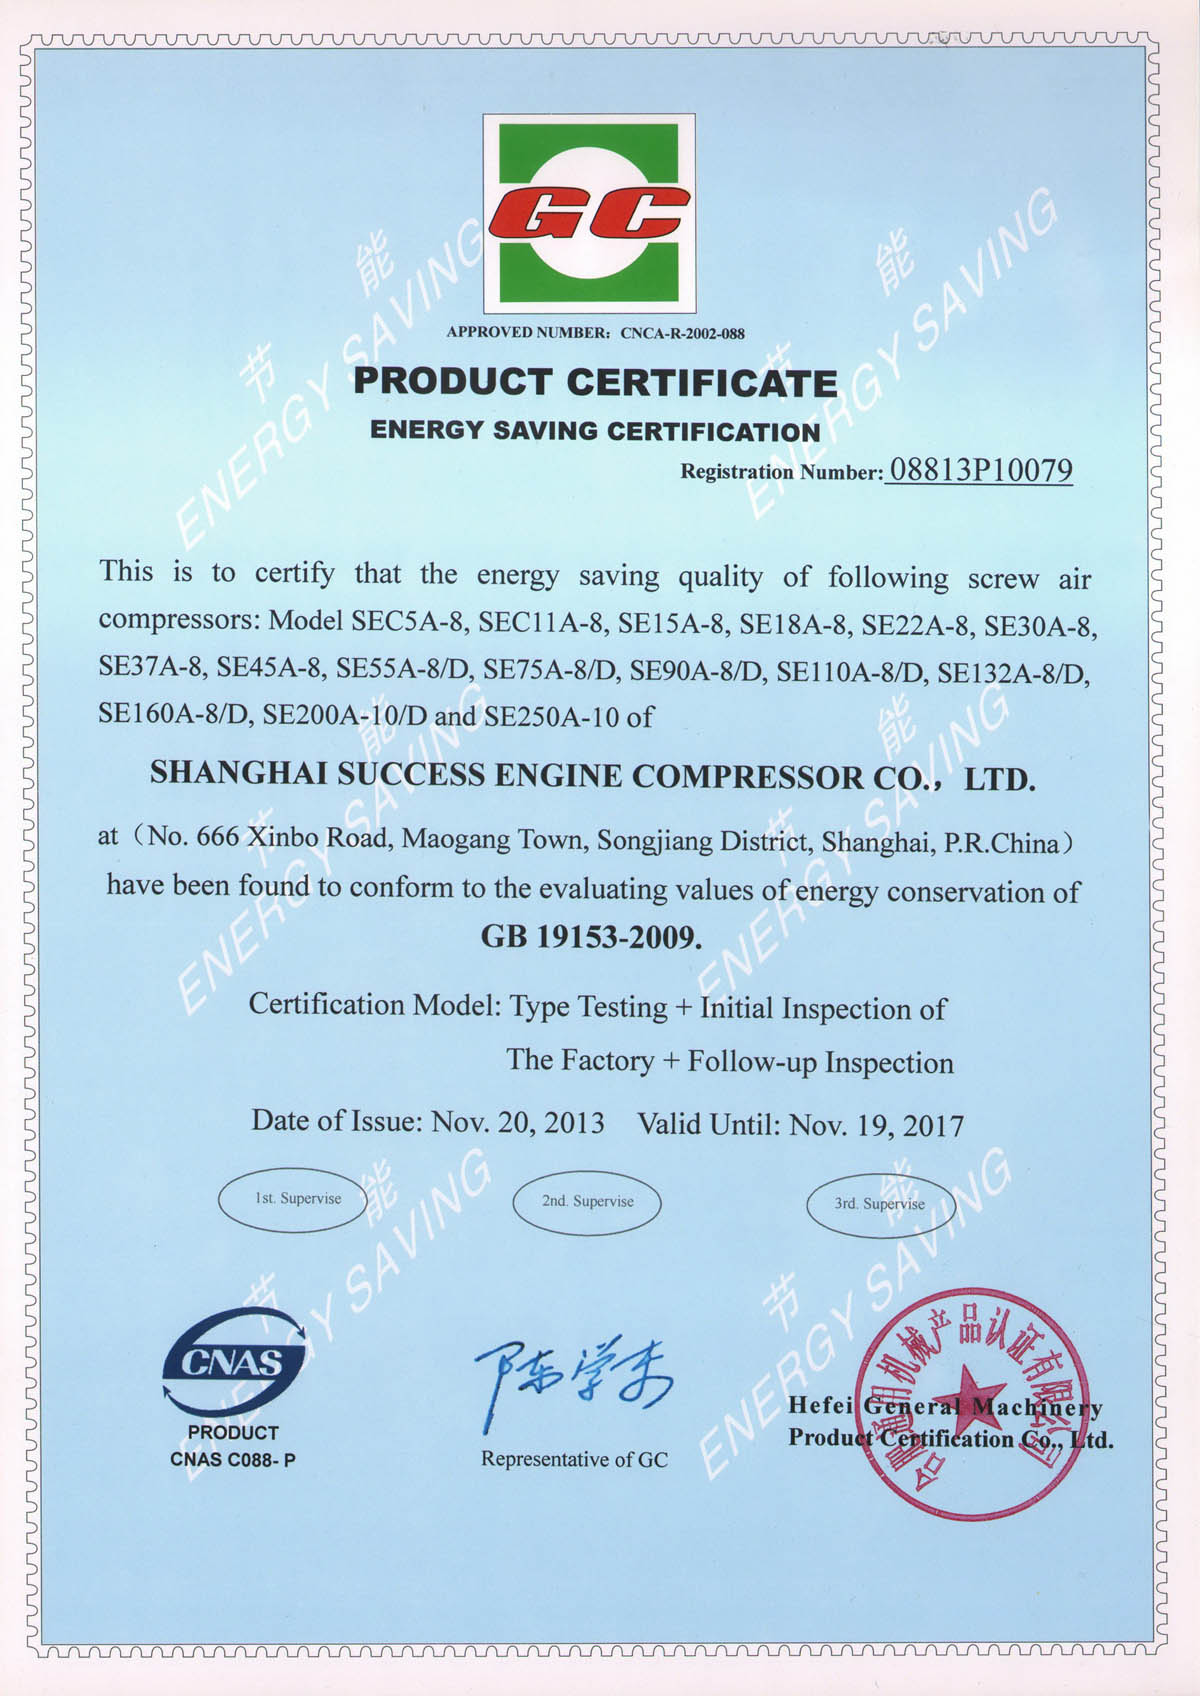 Energy Saving Certificate